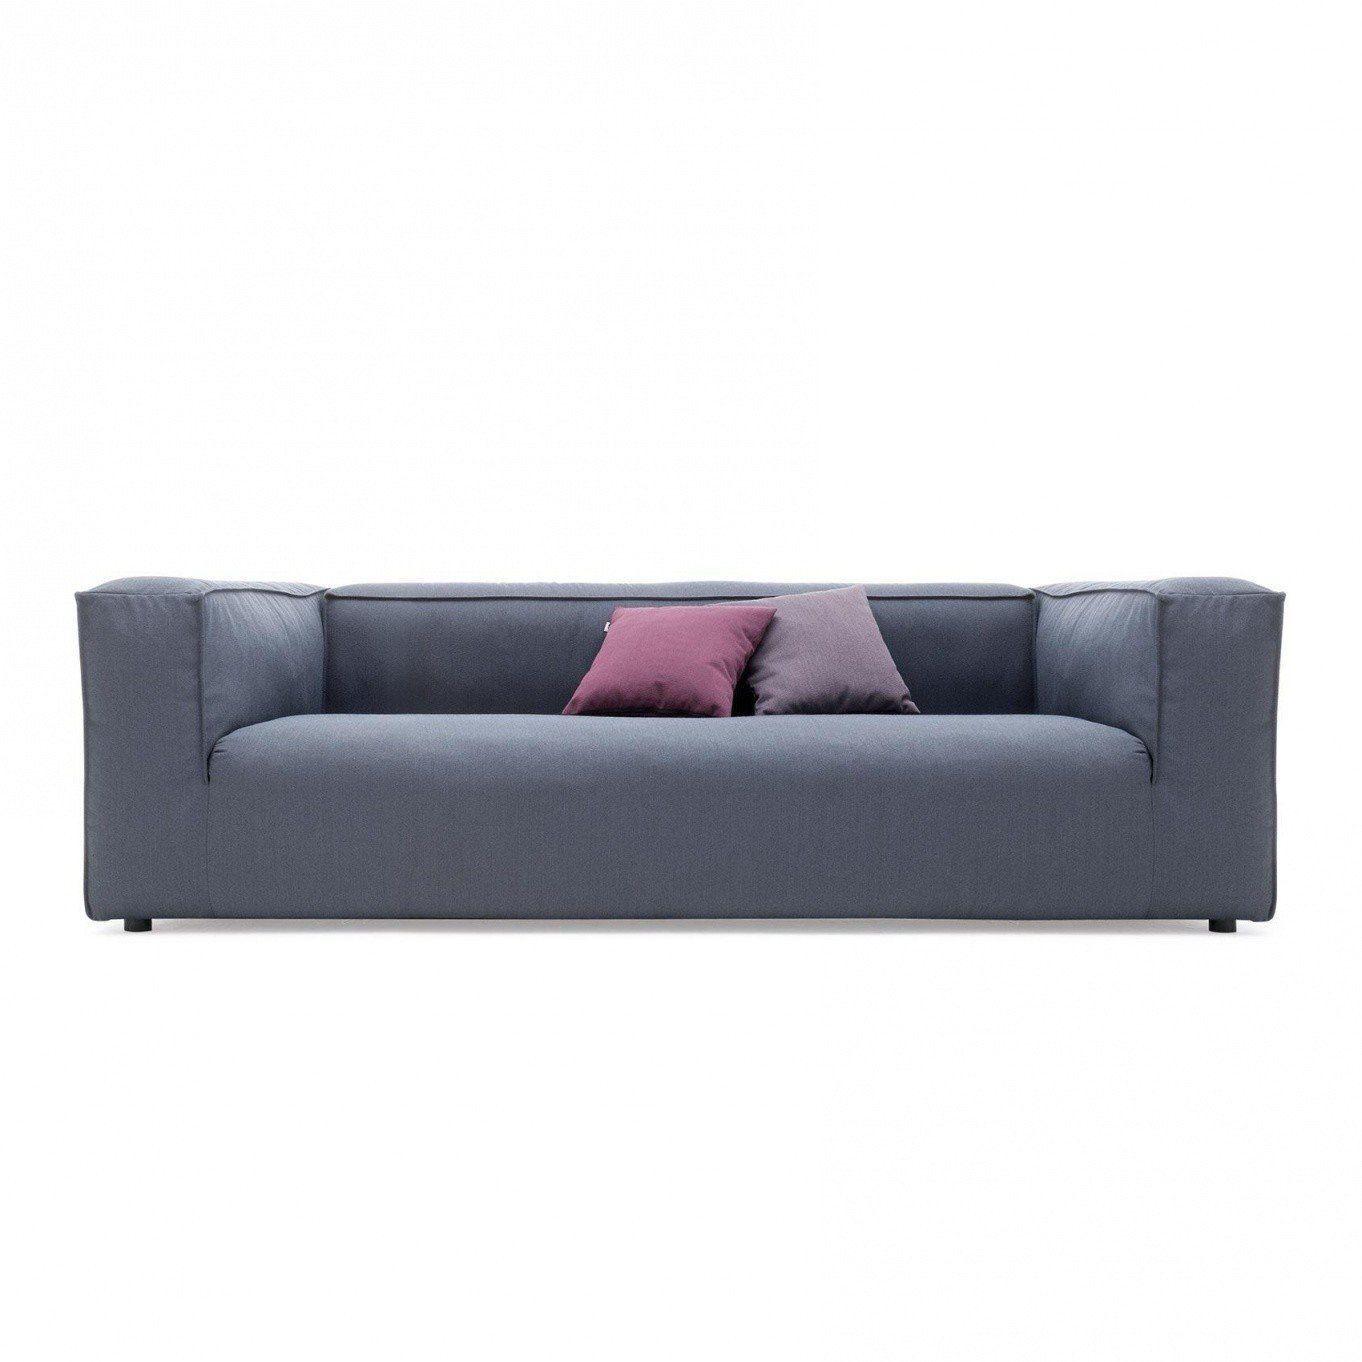 freistil 175 3-Sitzer Sofa | freistil Rolf Benz | AmbienteDirect.com